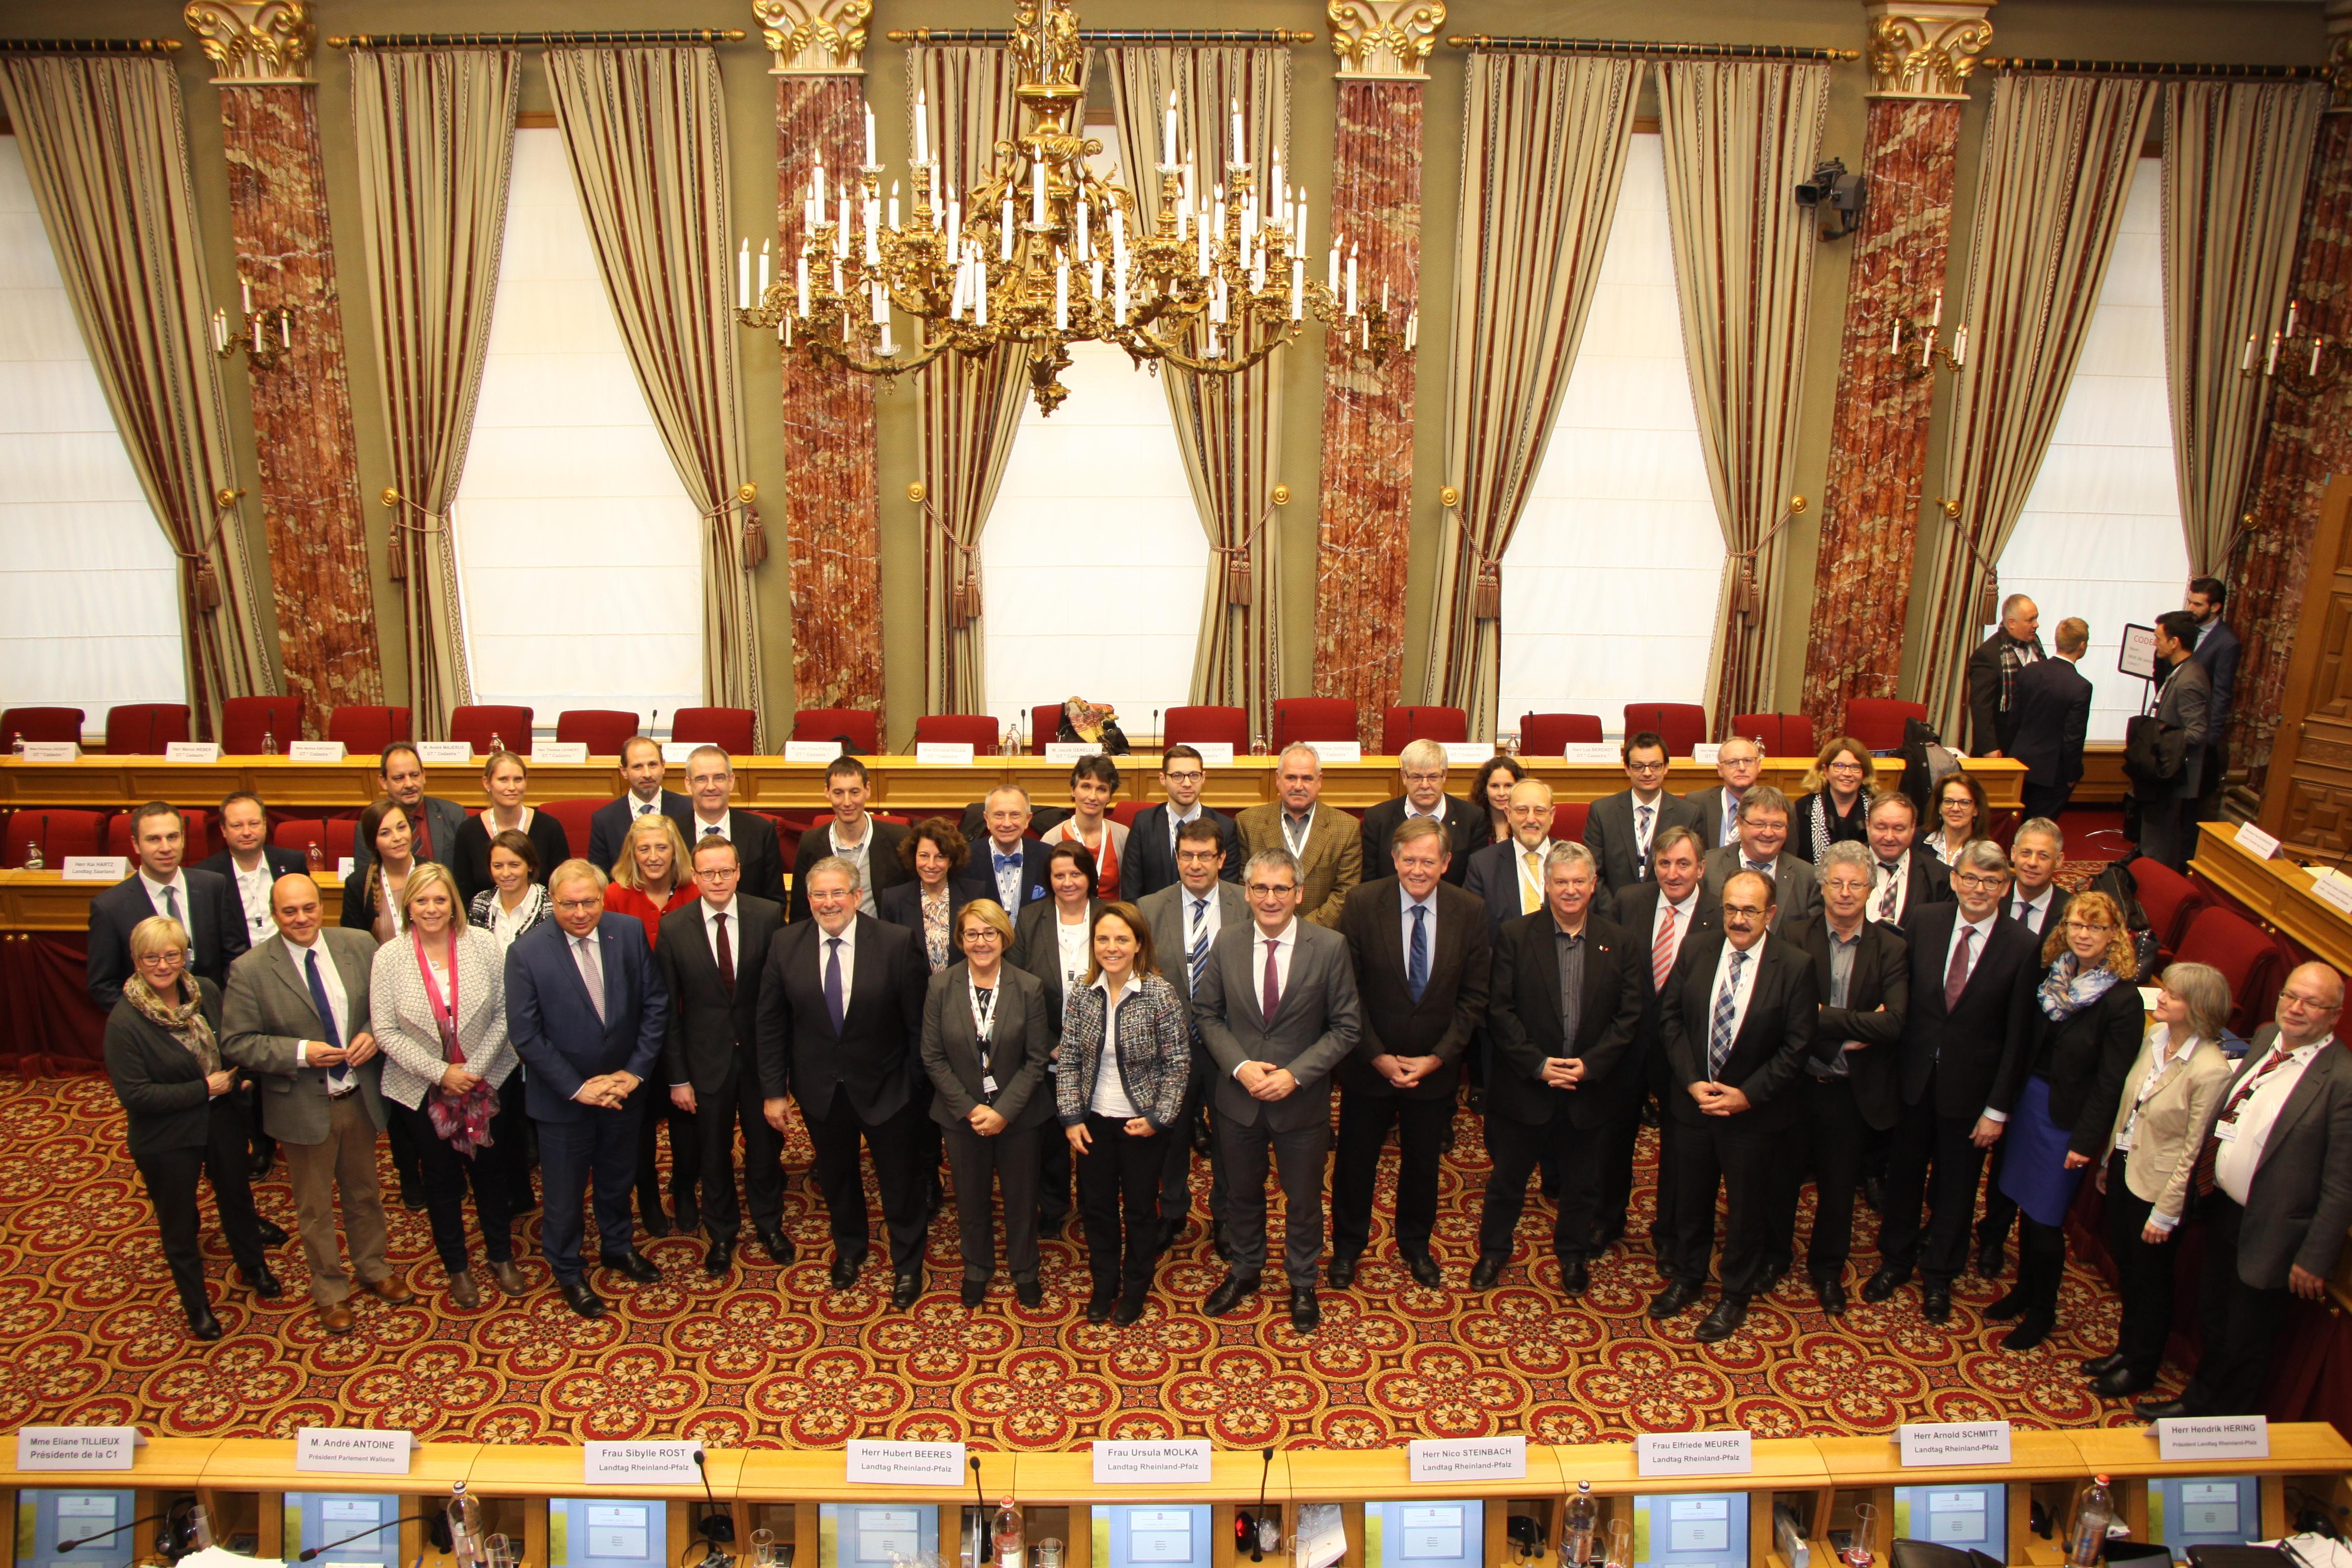 Conseil parlementaire interrégional